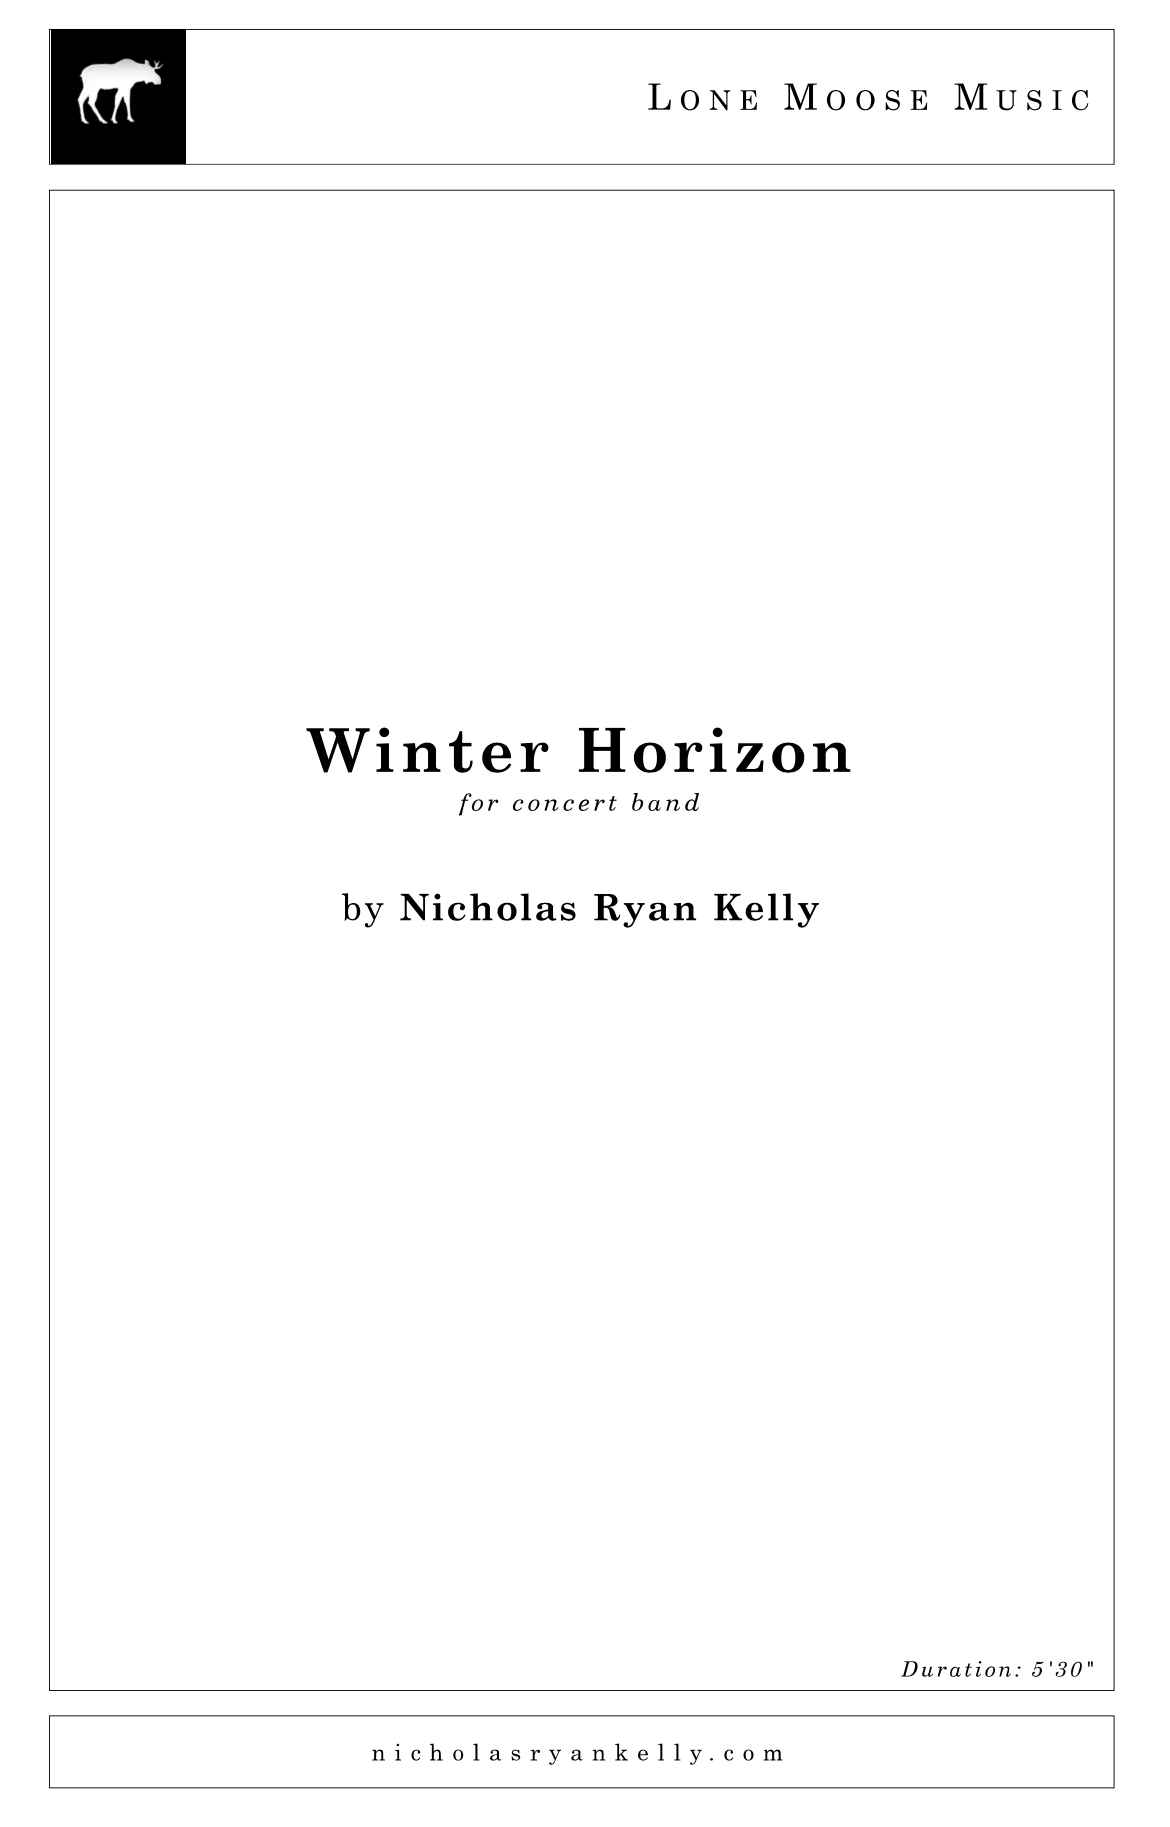 Winter Horizon by Nicholas Ryan Kelly